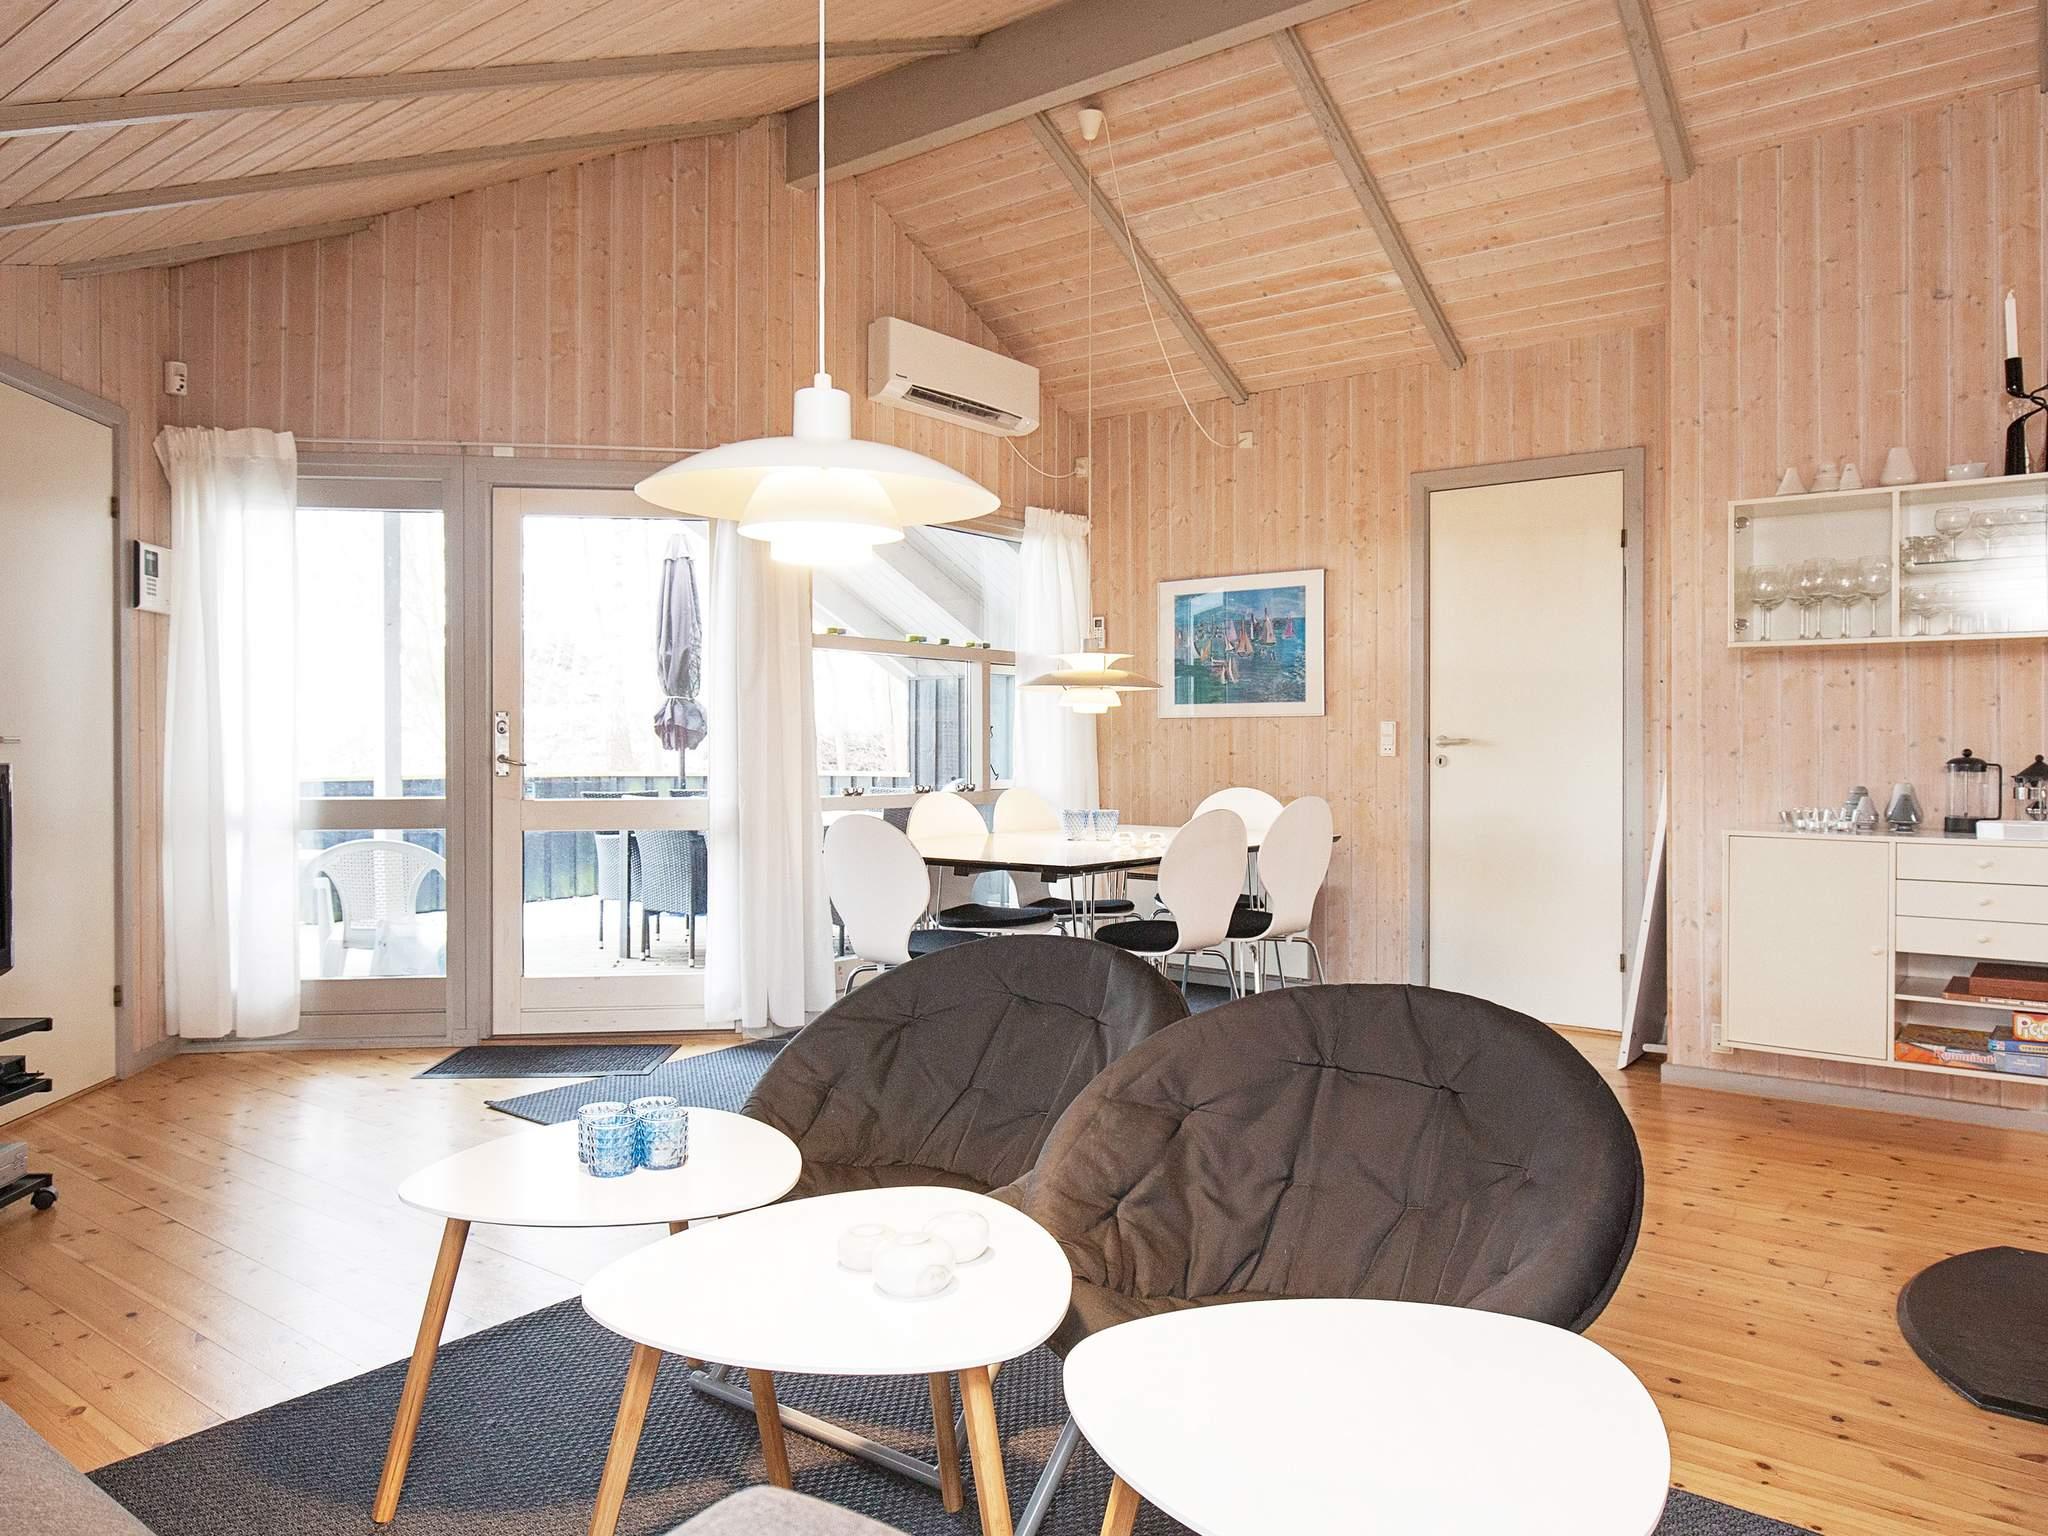 Ferienhaus Melby (83177), Melby, , Nordseeland, Dänemark, Bild 3